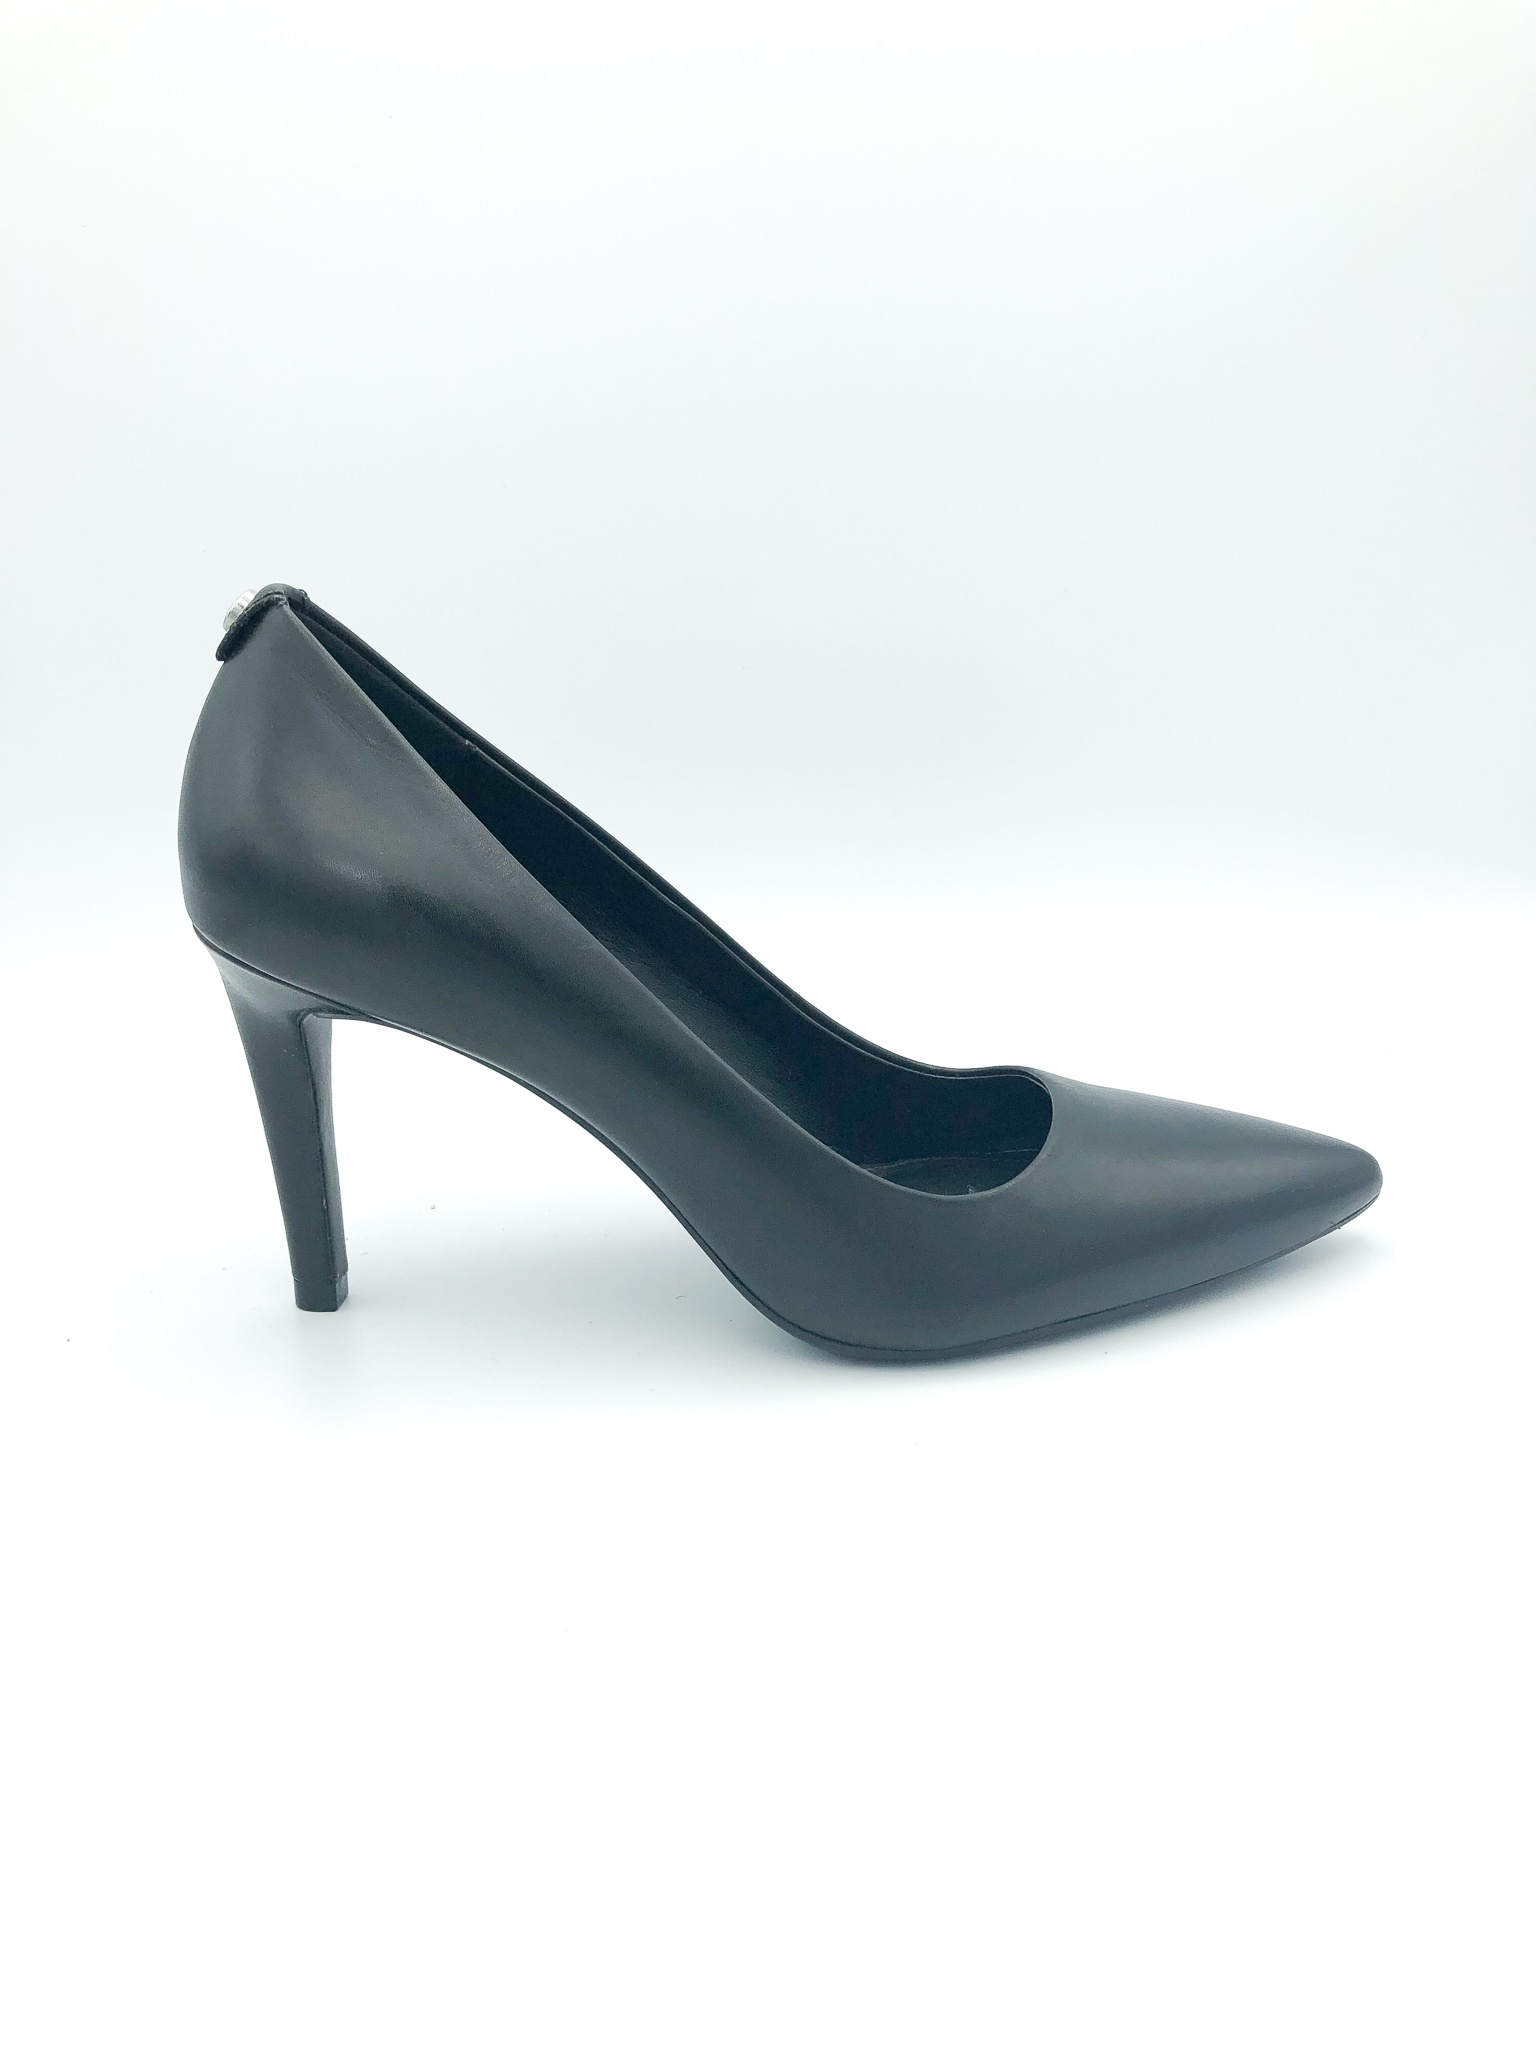 7ec96027152e MICHAEL KORS - DOROTHY FLEX PUMP IN BLACK - the Urban Shoe Myth